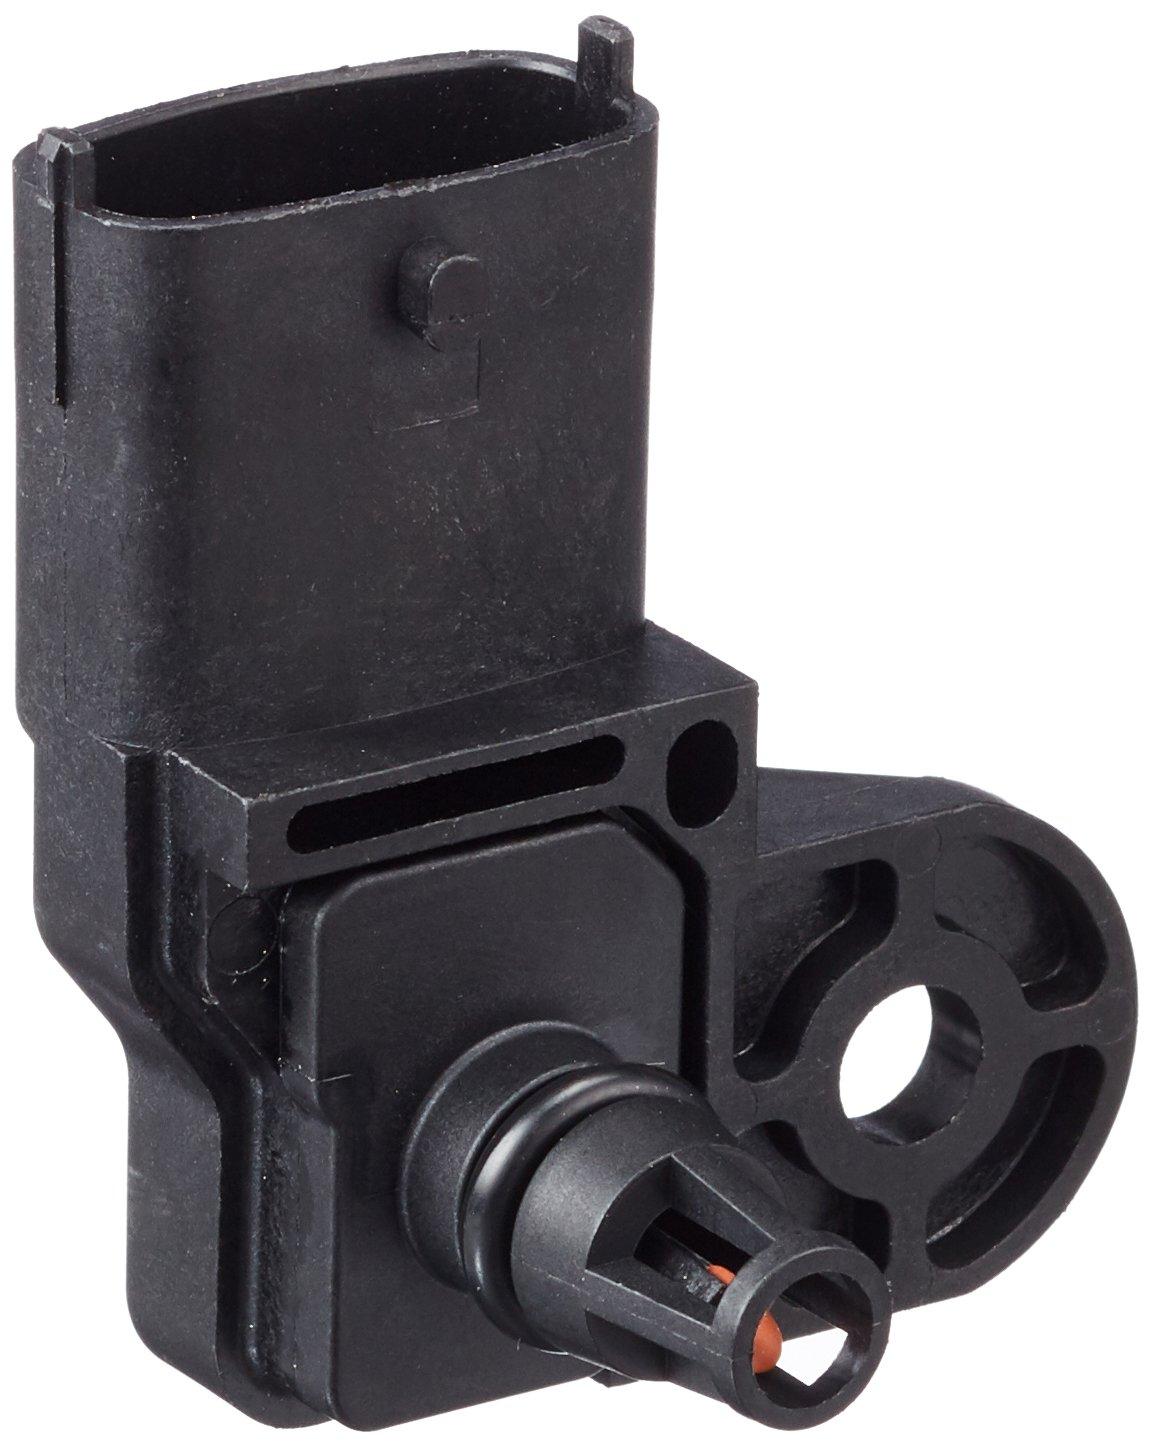 HELLA 6PP 009 400-951 Sensor, intake manifold pressure, Number of connectors 4 Hella KGaA Hueck & Co.